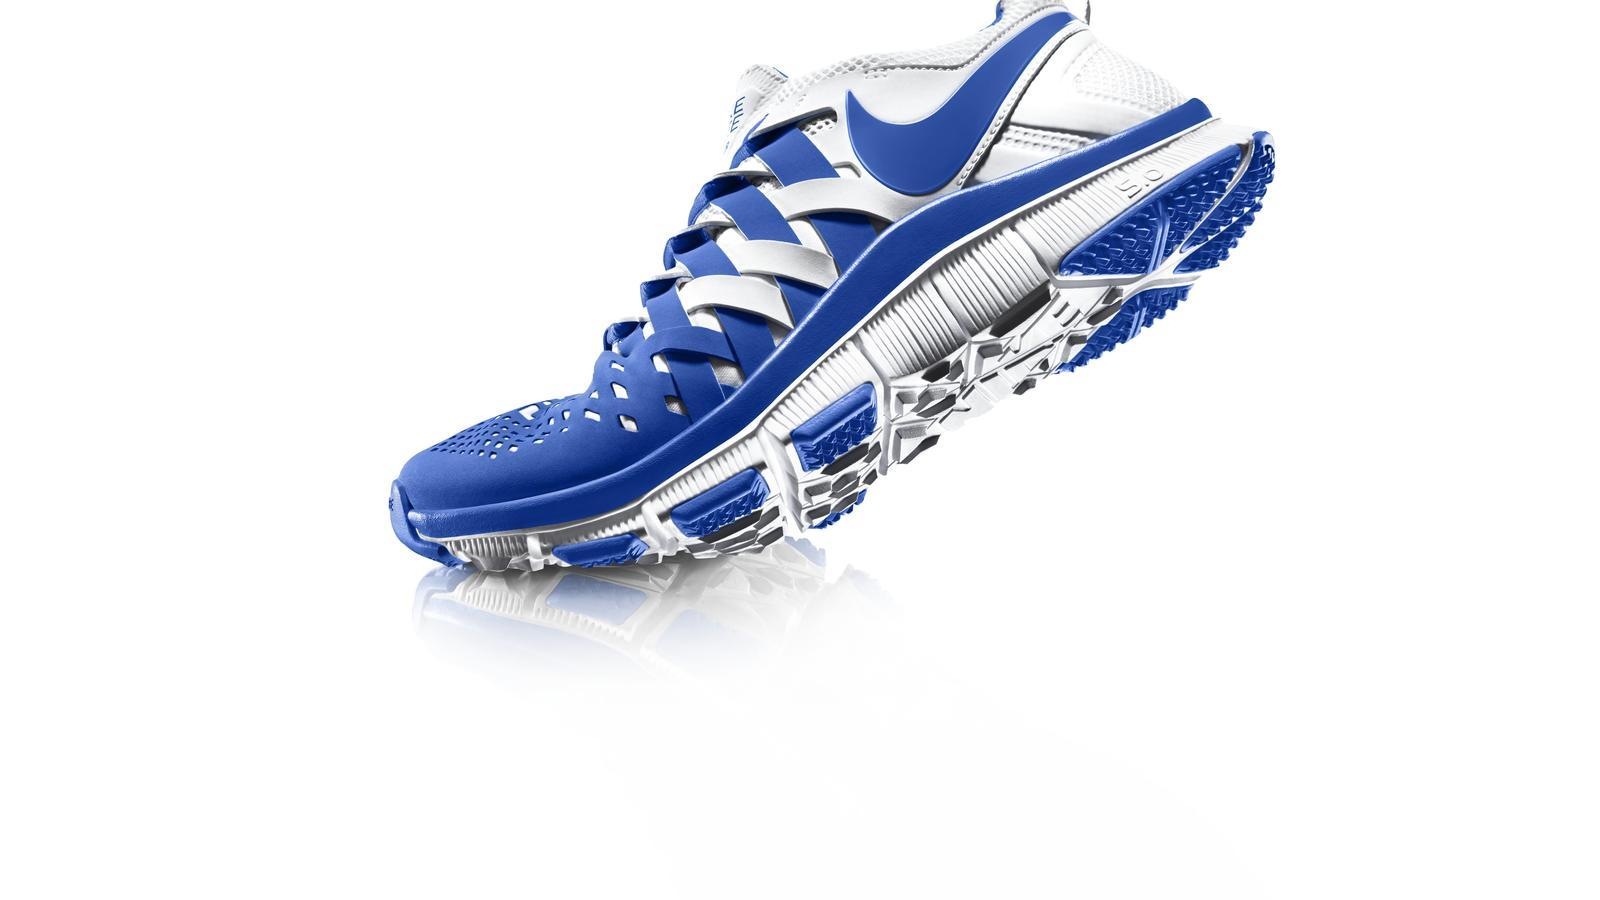 fa13_at_free_trainer_5_579809-107_flex_blue